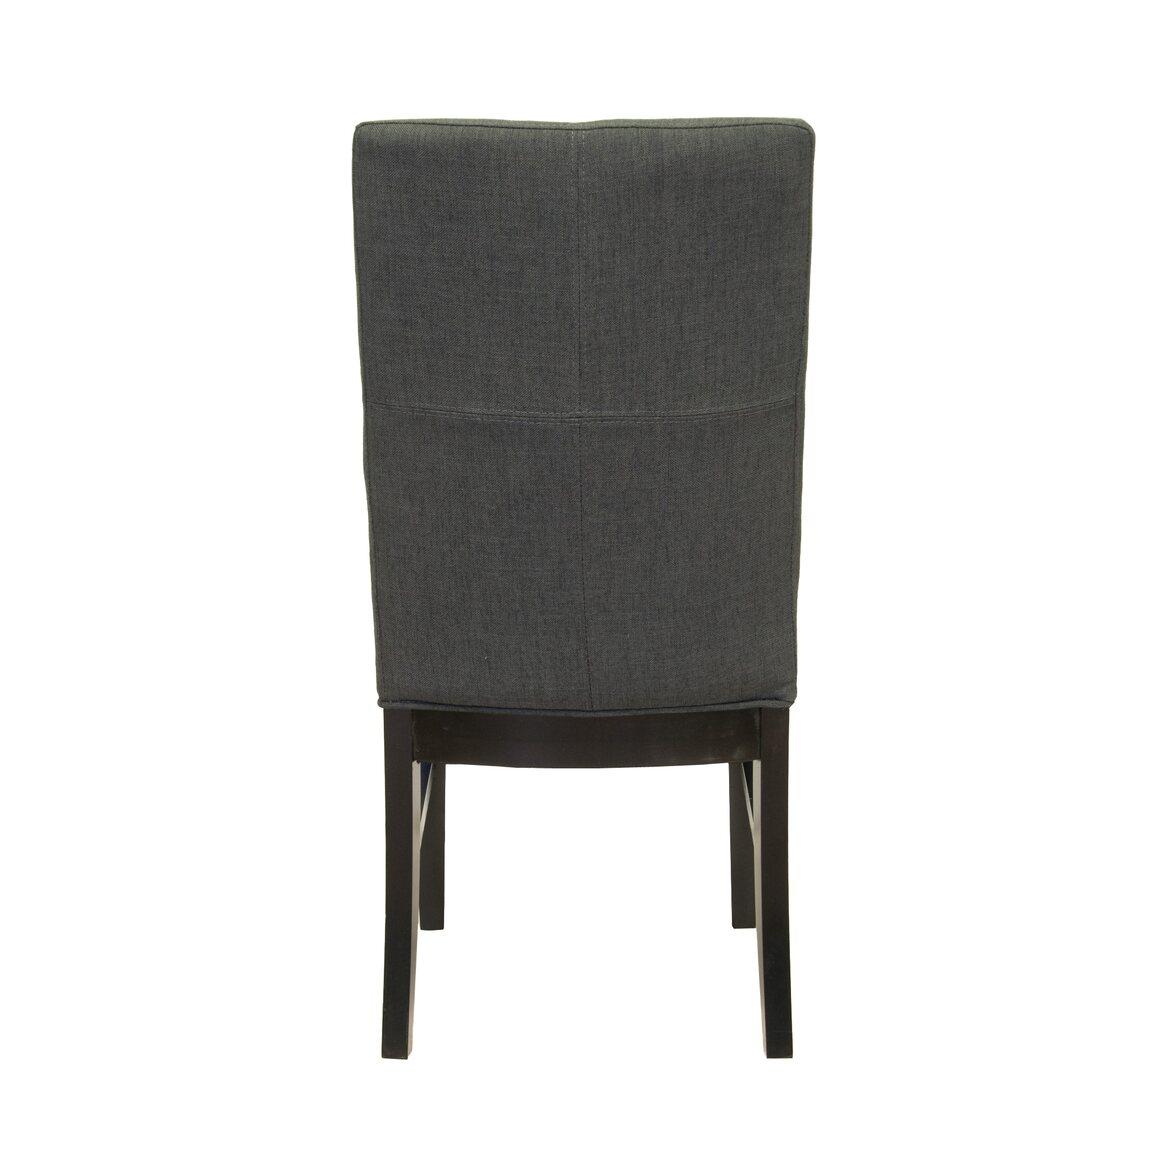 Стул Deng grey 3   Обеденные стулья Kingsby